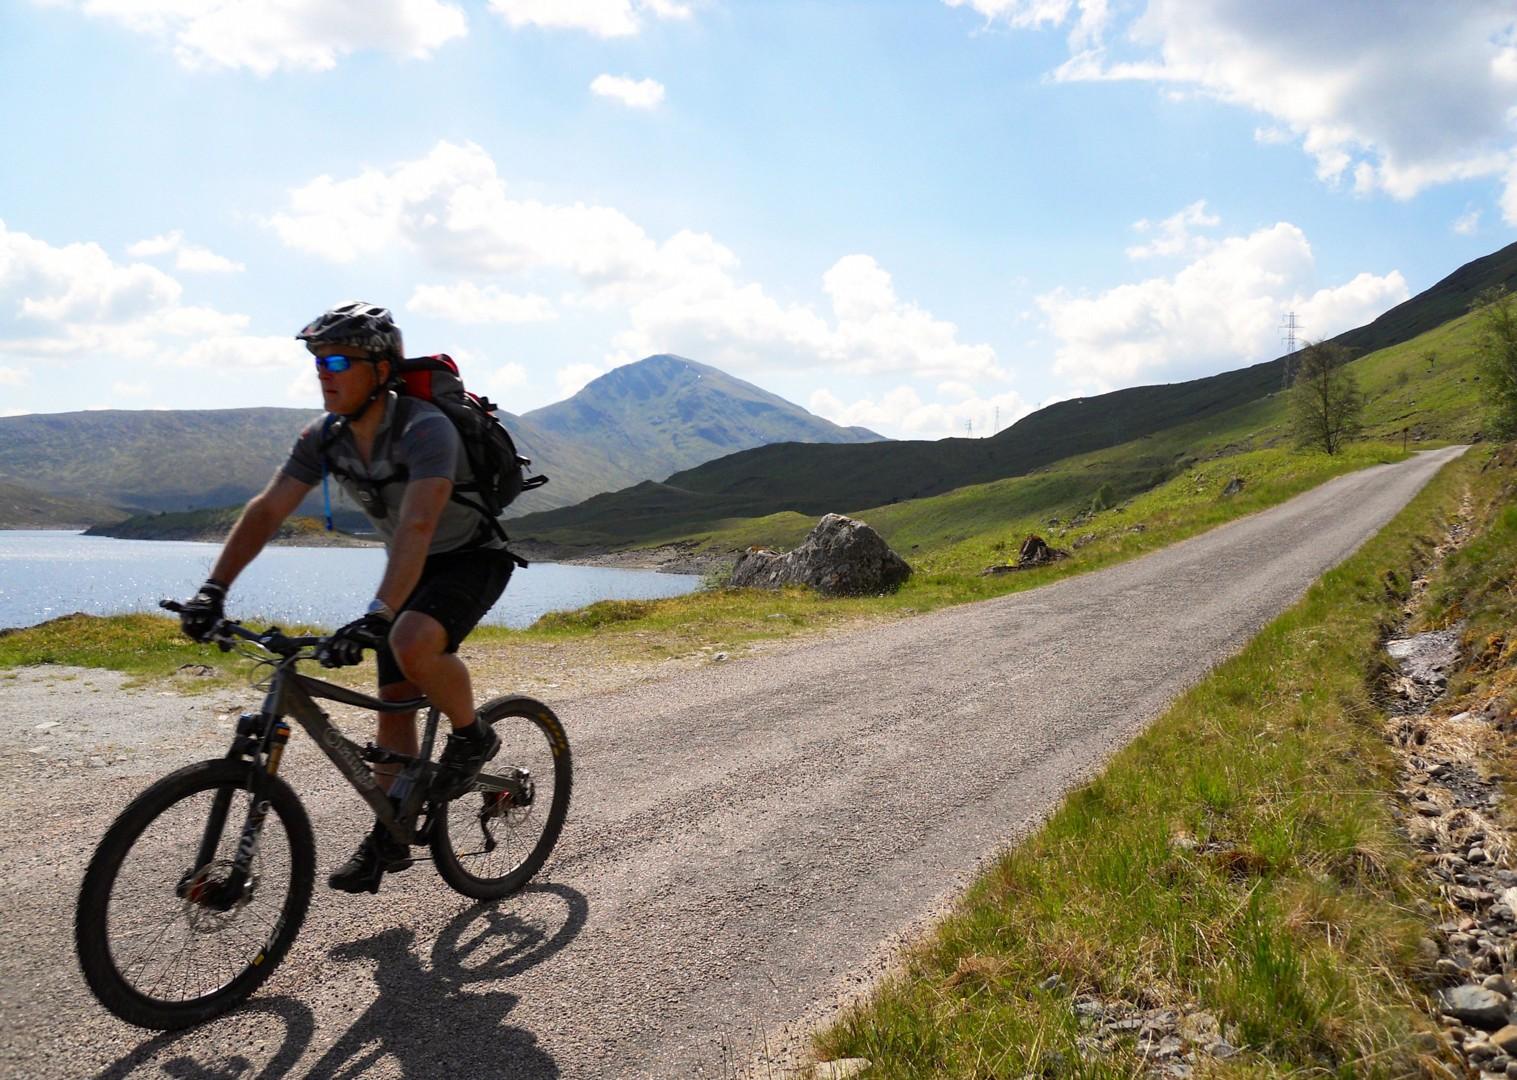 glen-esk-guided-mountain-biking-trip.jpg - Scotland - Highlands Coast to Coast - Mountain Biking